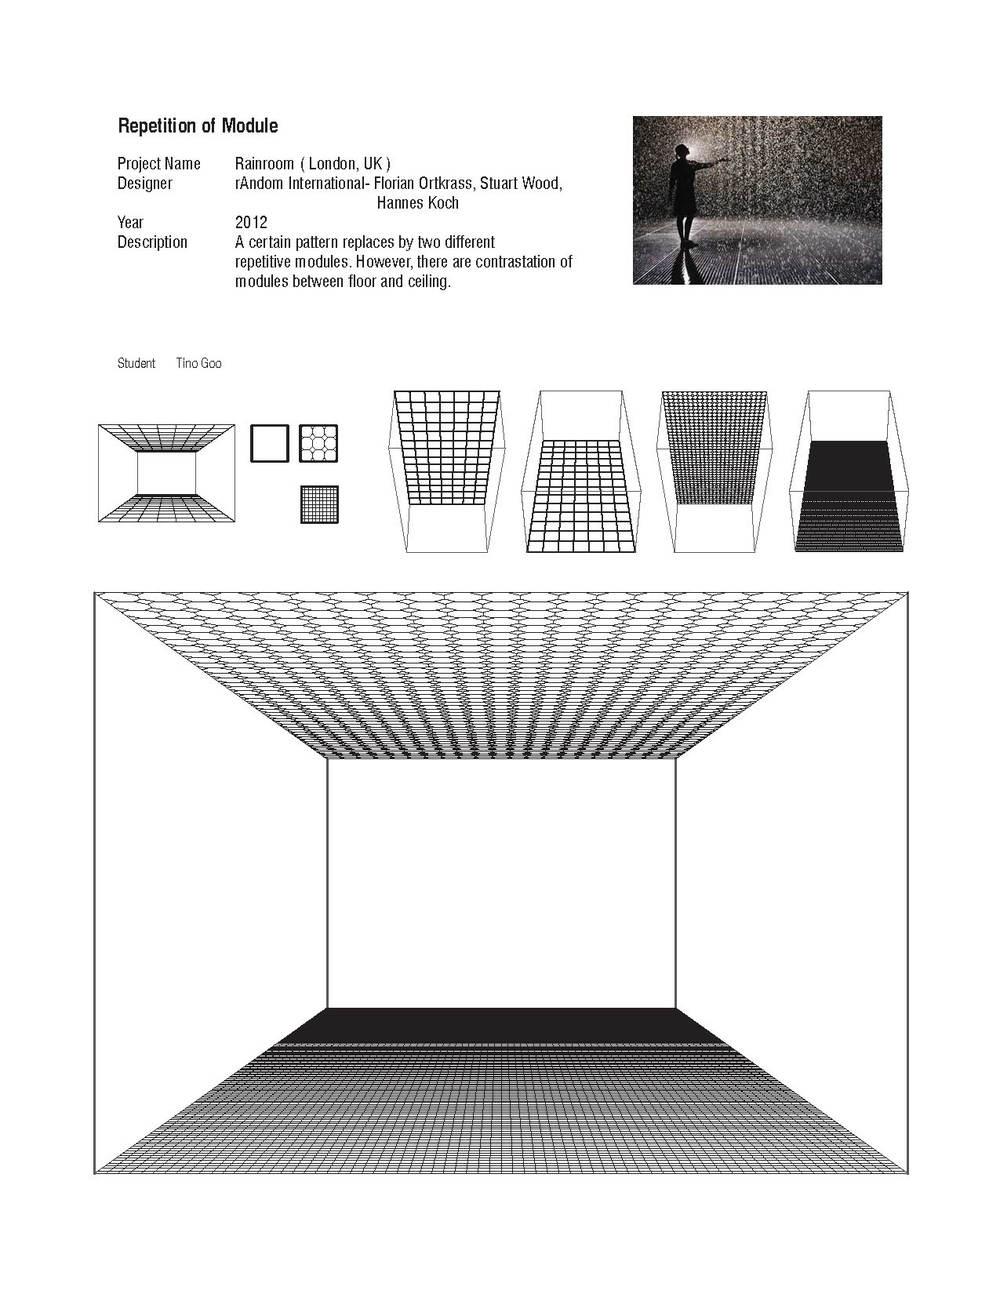 Goo_hyeongmo_Rainroom_Page_3.jpg